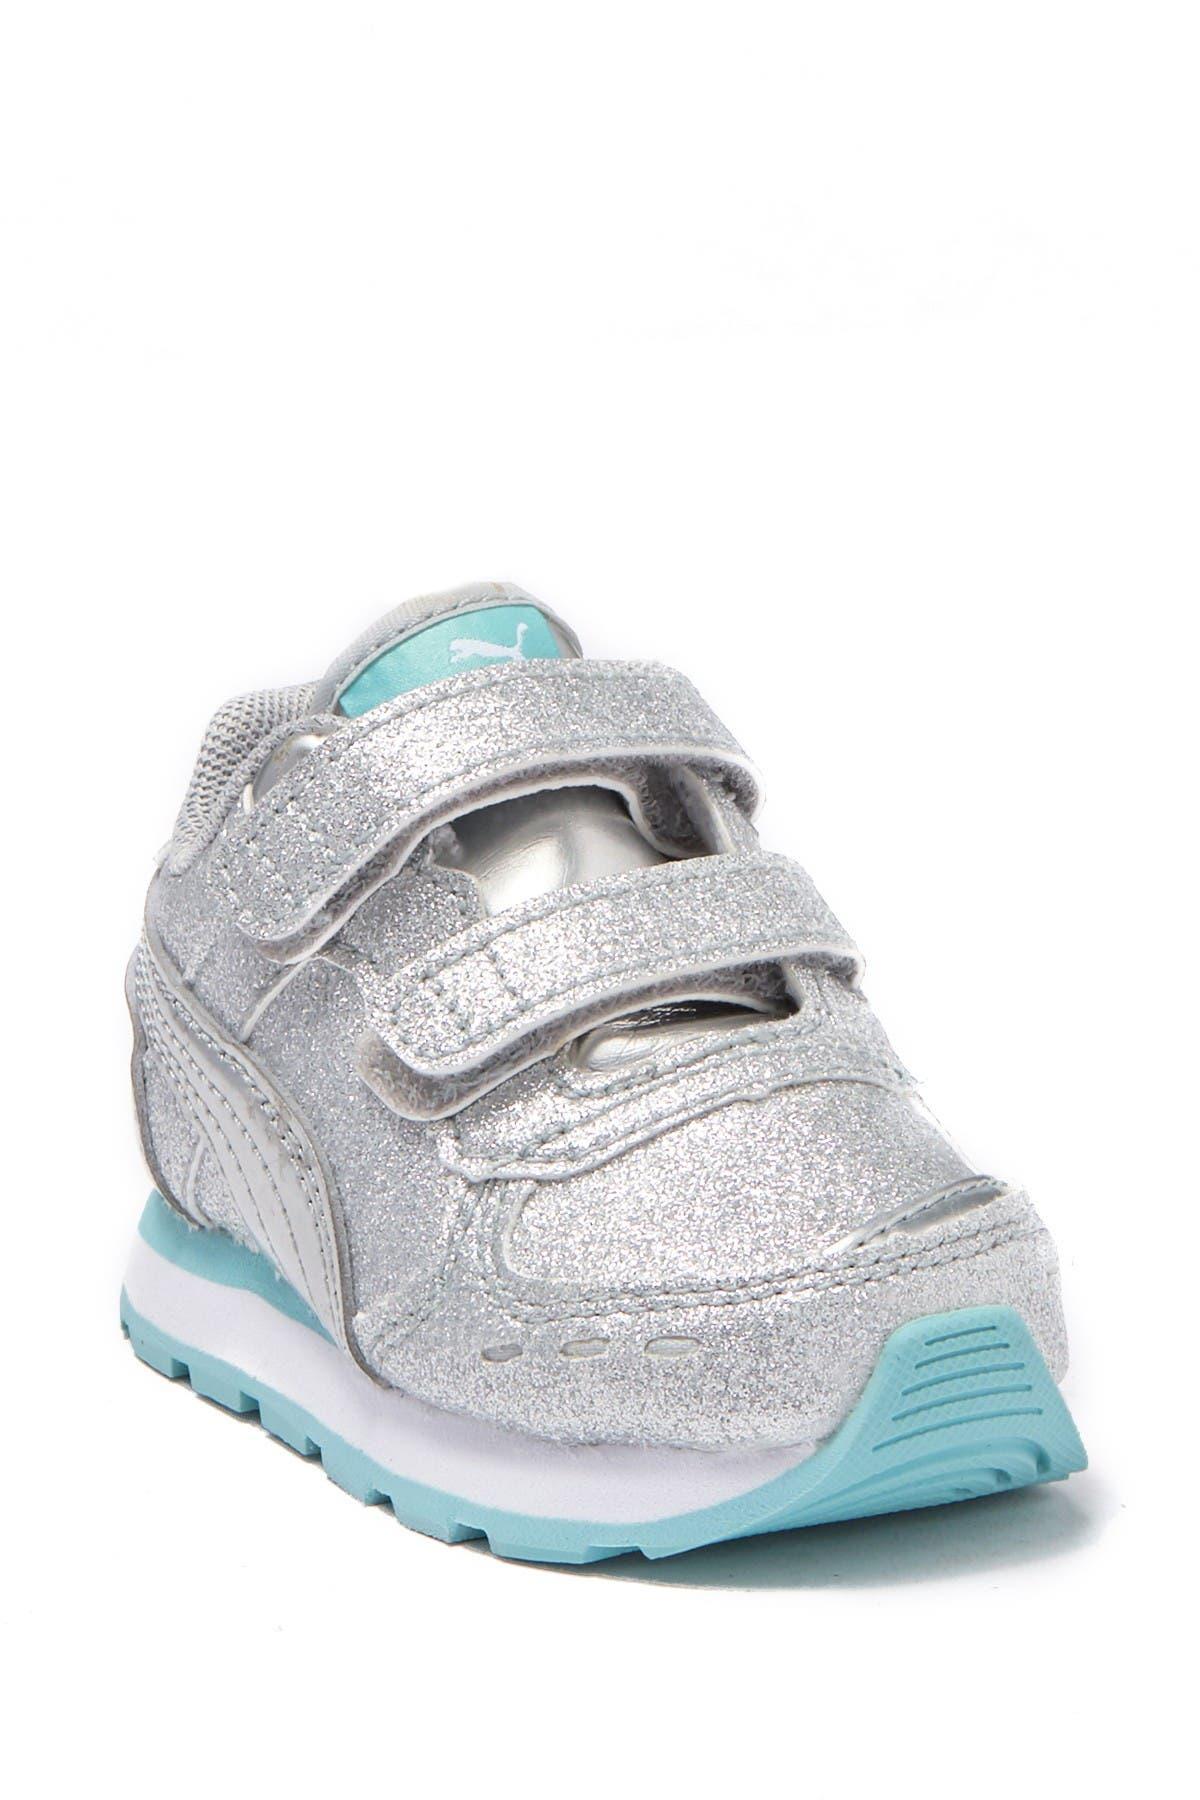 Image of PUMA Vista Glitz V INF Sneaker